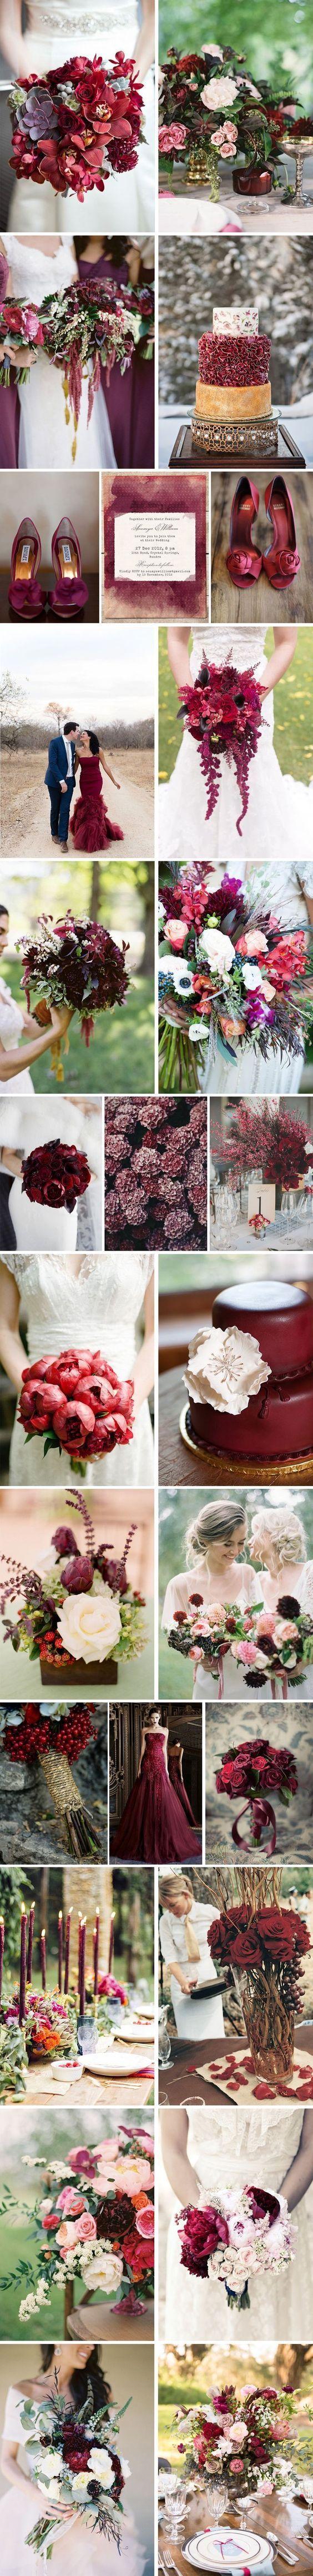 35 {Aubergine and Marsala} Classic Fall Wedding Color Ideas | http://www.deerpearlflowers.com/35-aubergine-marsala-classic-fall-wedding-color-ideas/: